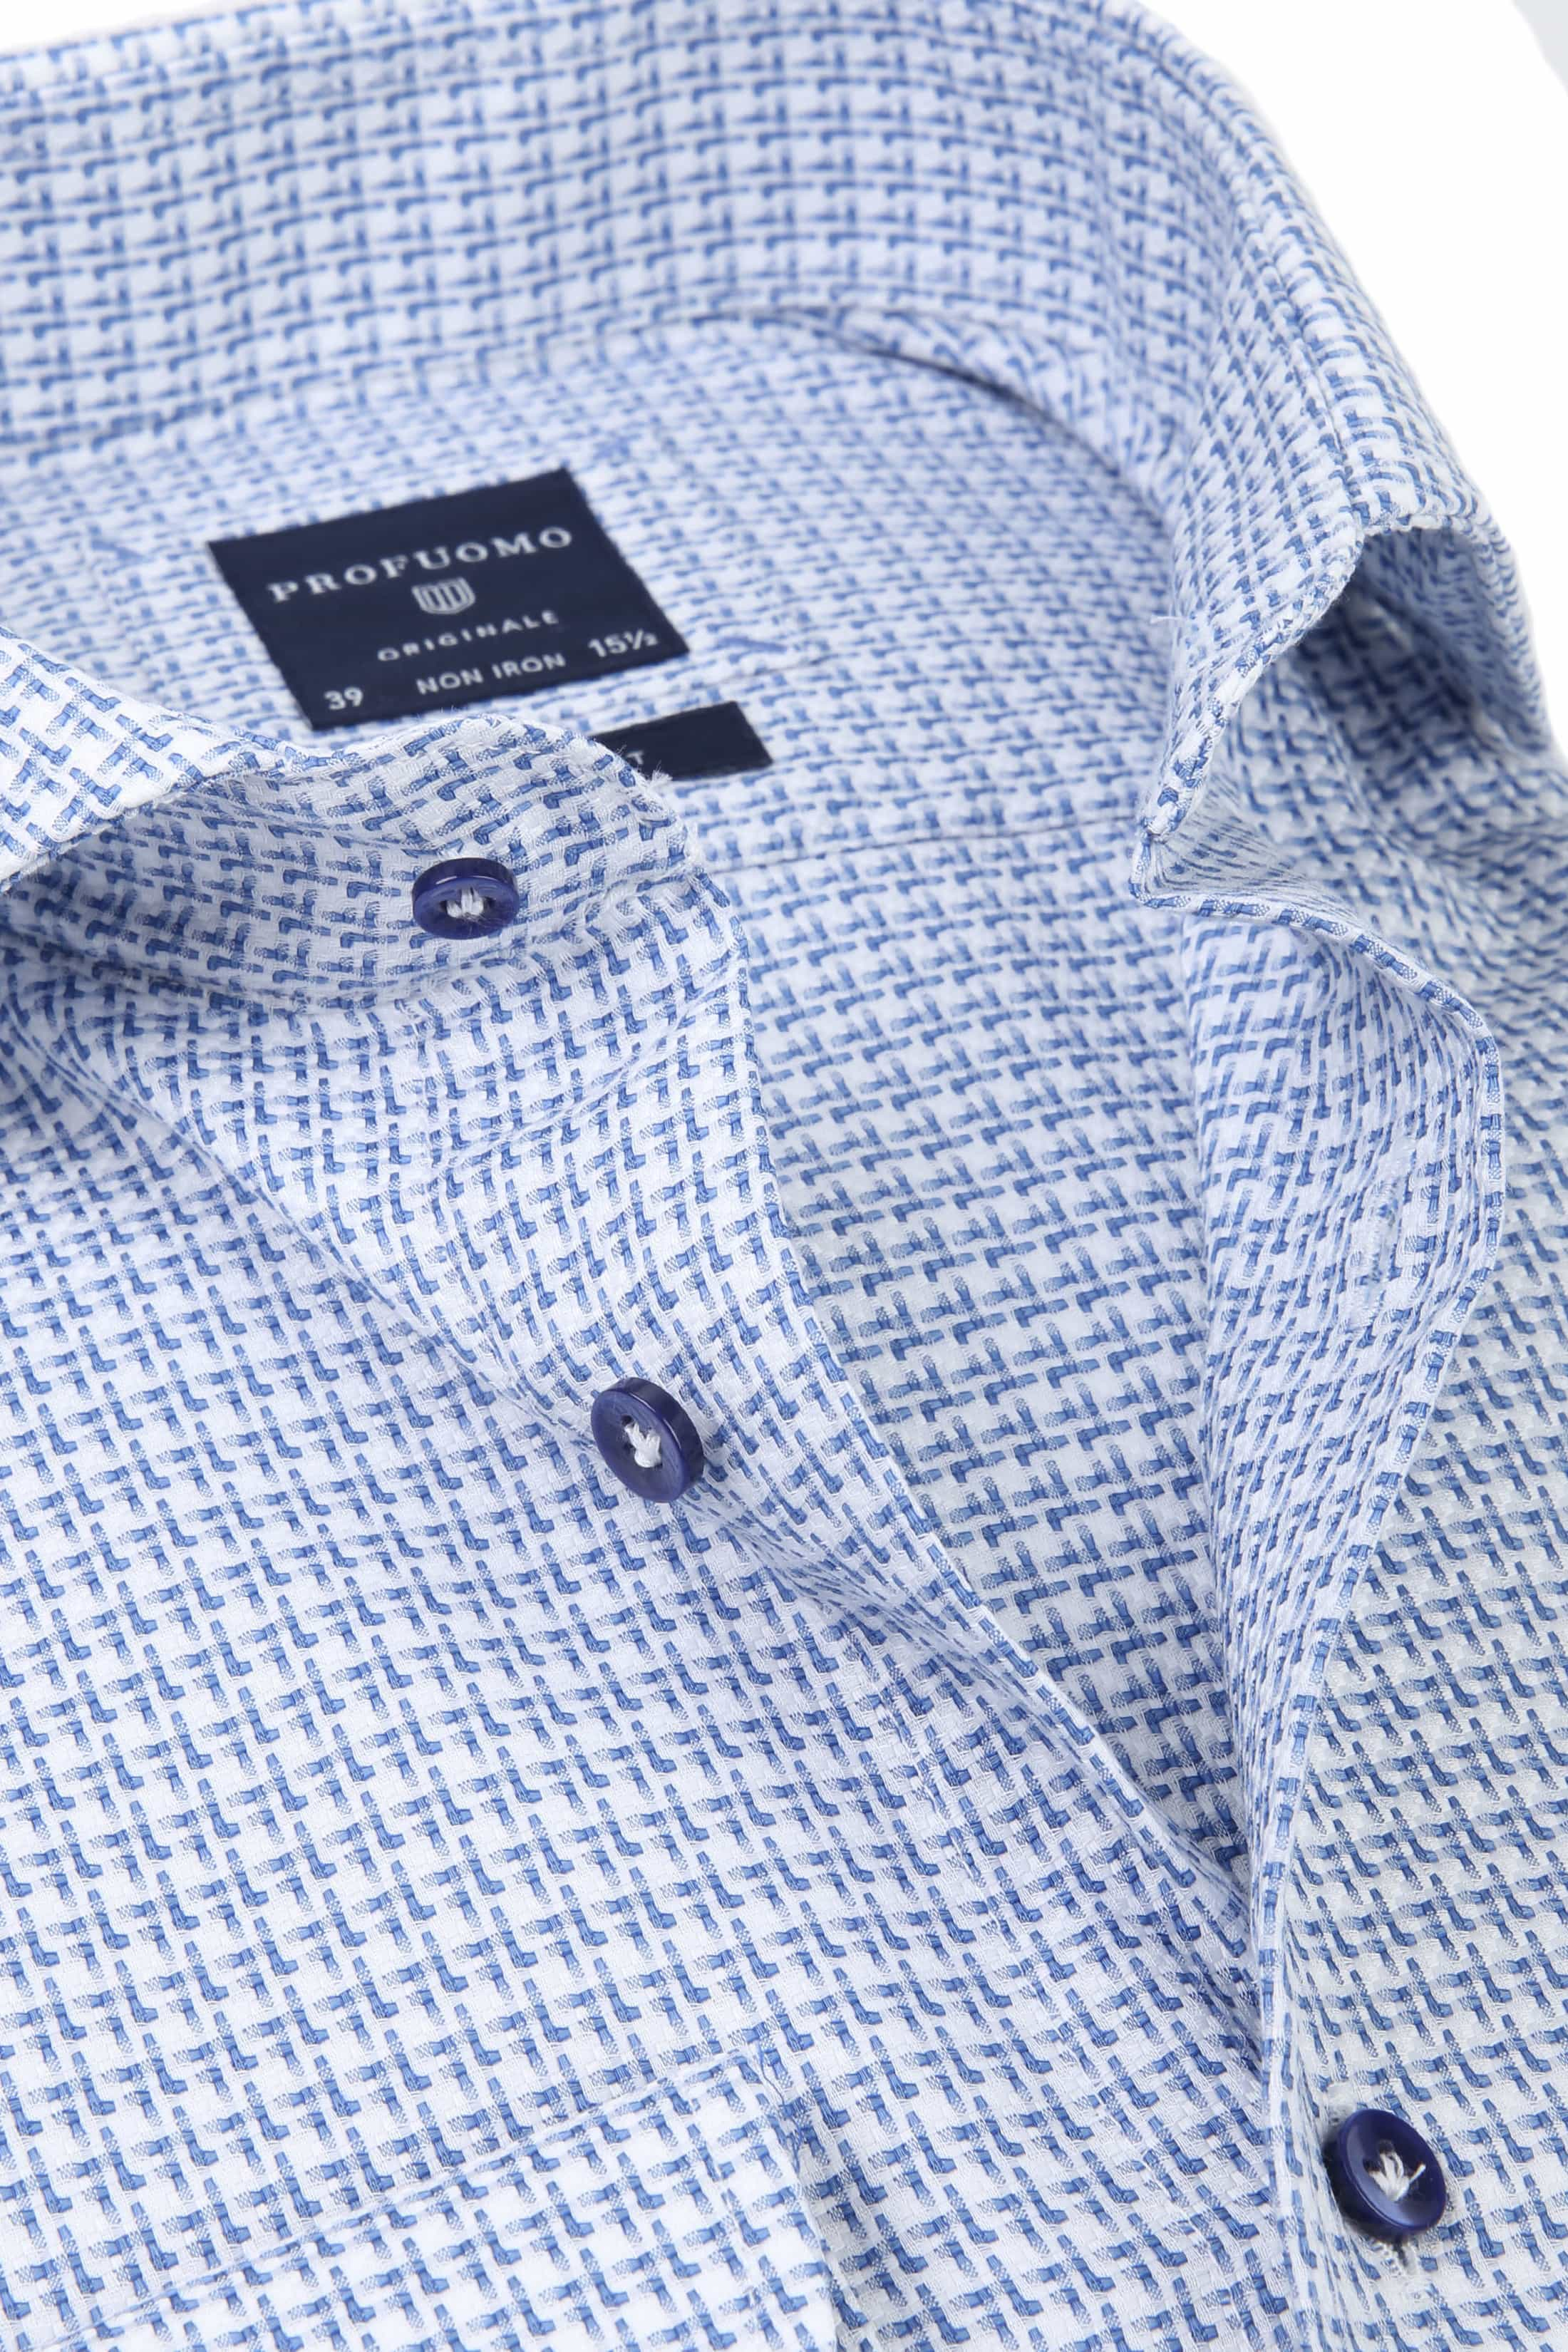 Profuomo Shirt CAW Dessin Blue foto 1